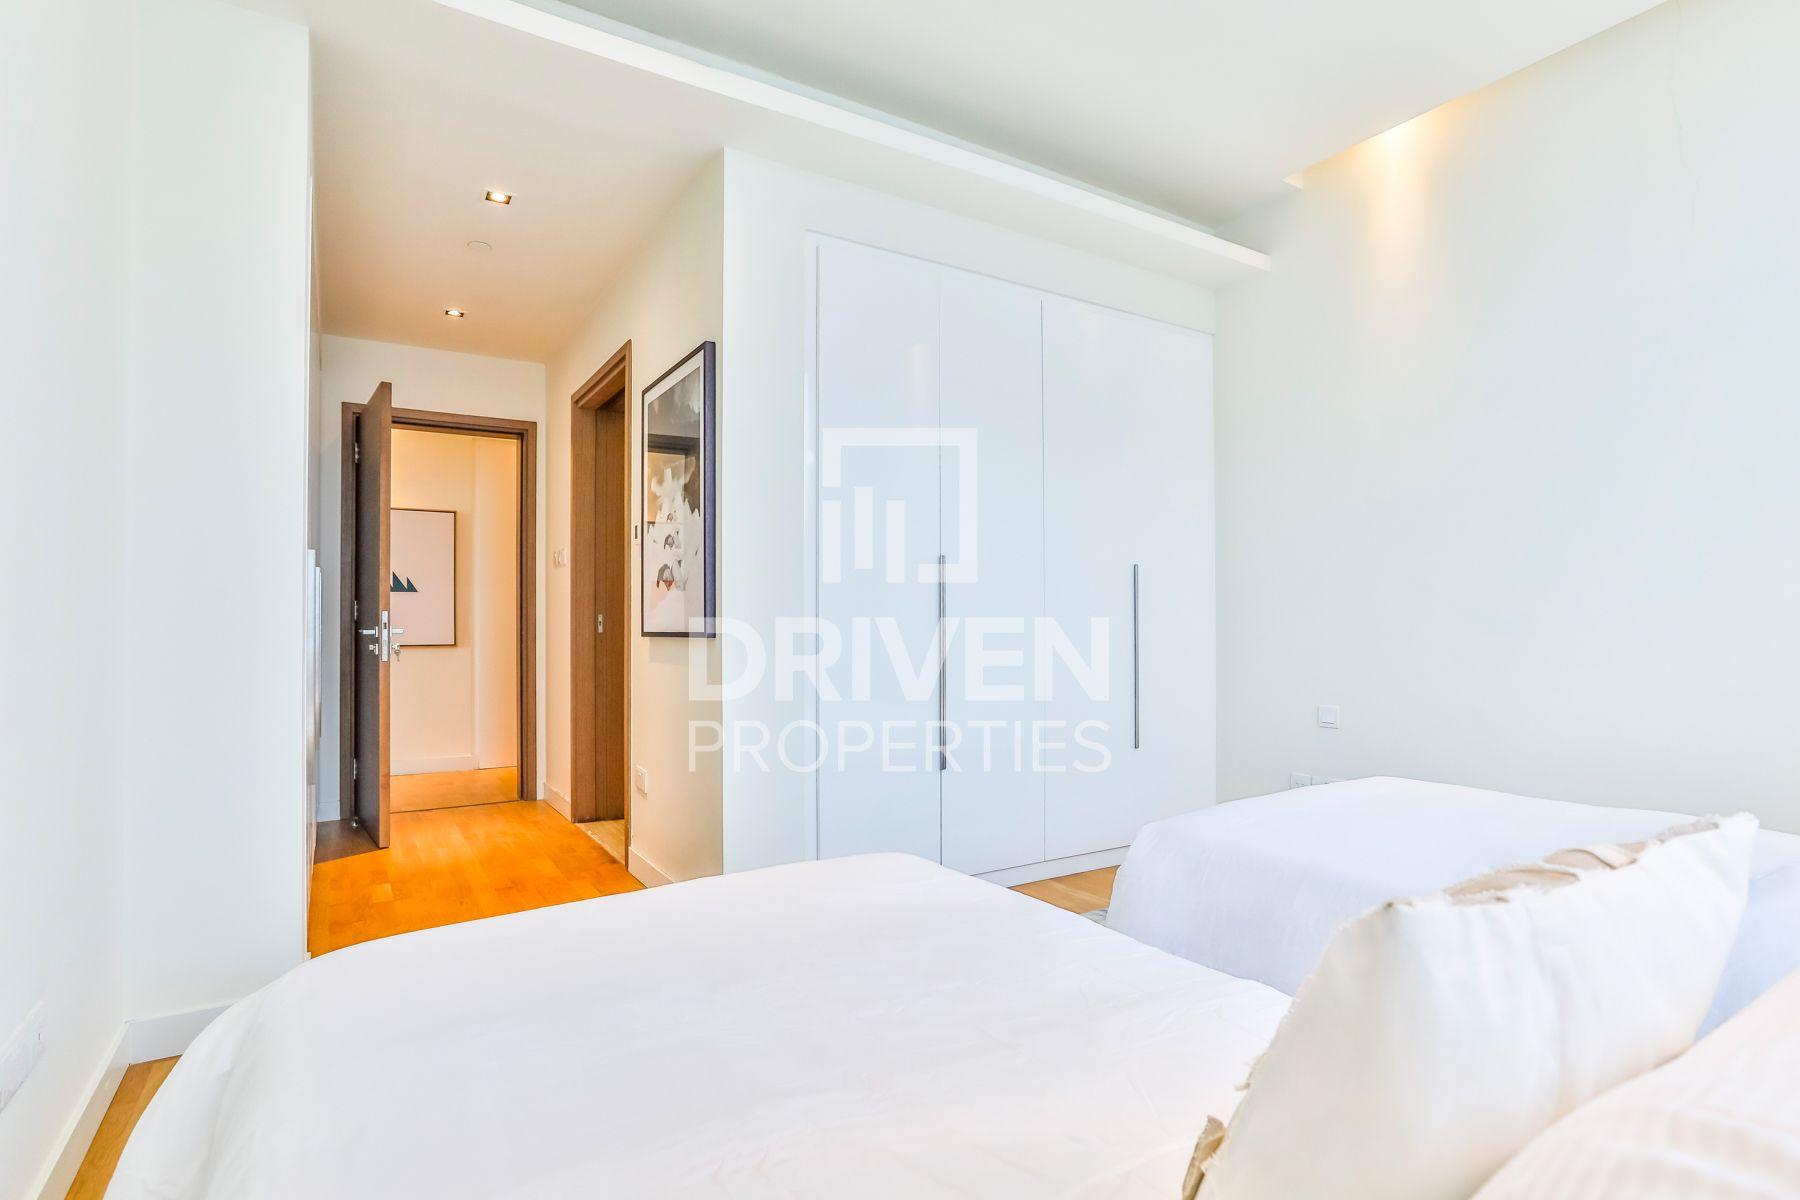 Reasonably Priced 3 Bedroom in City Walk